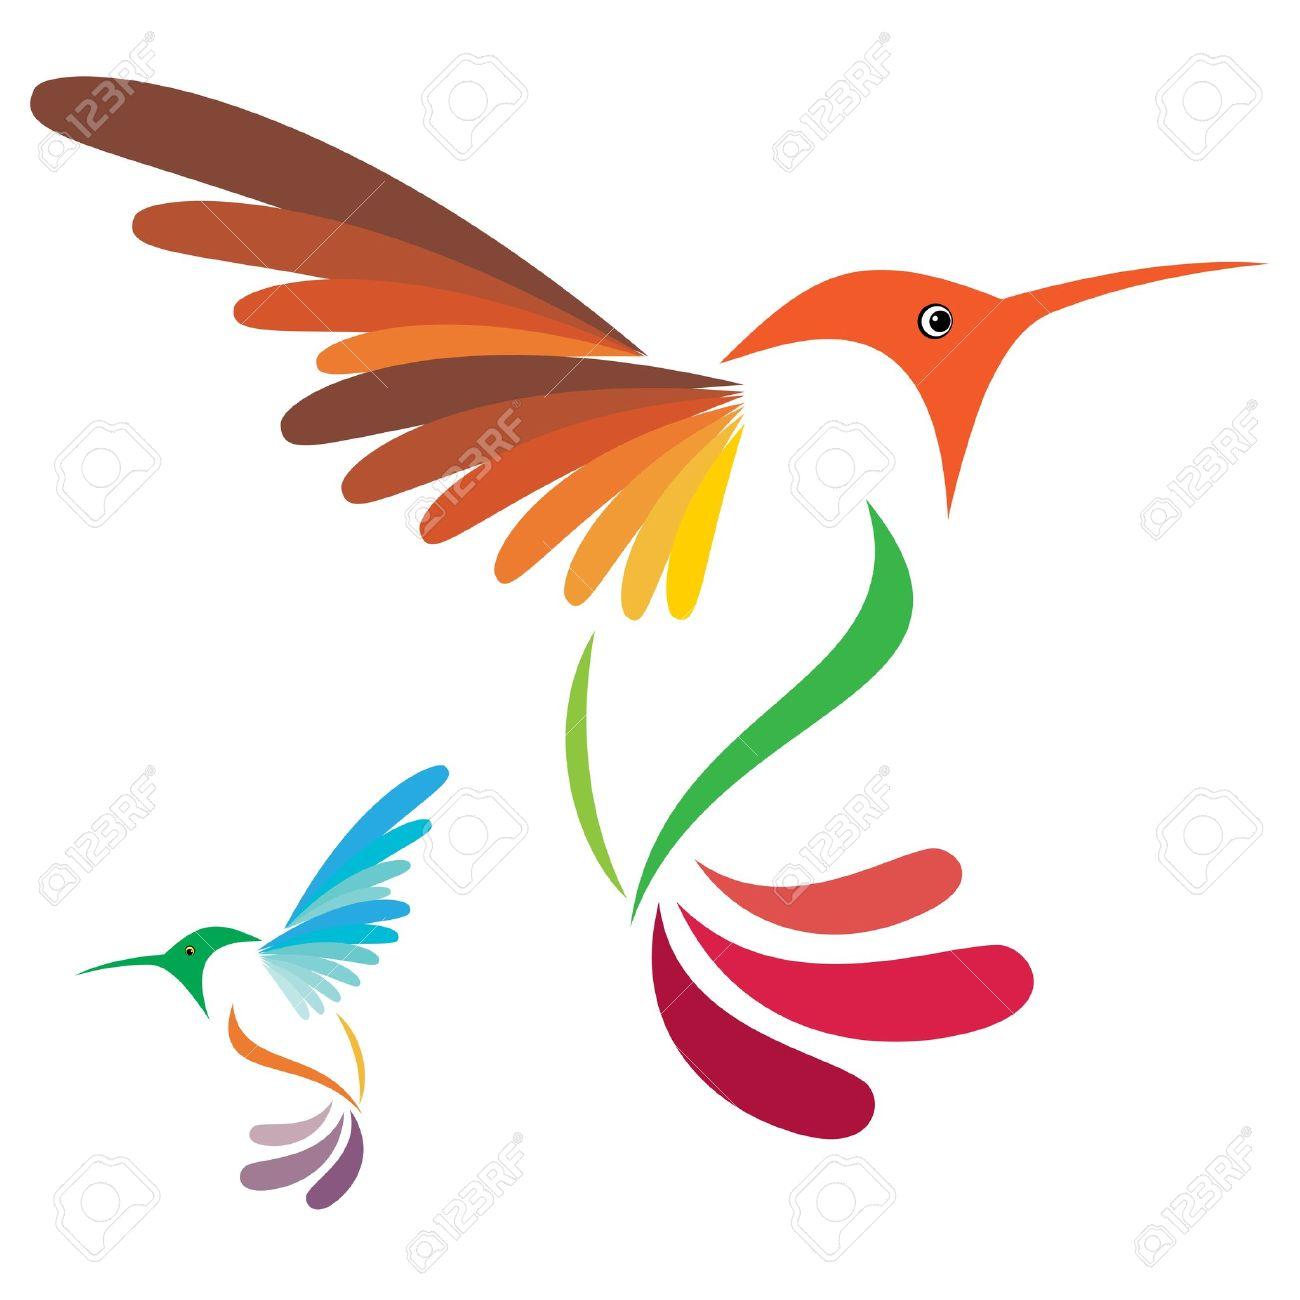 3,663 Hummingbird Stock Illustrations, Cliparts And Royalty Free.